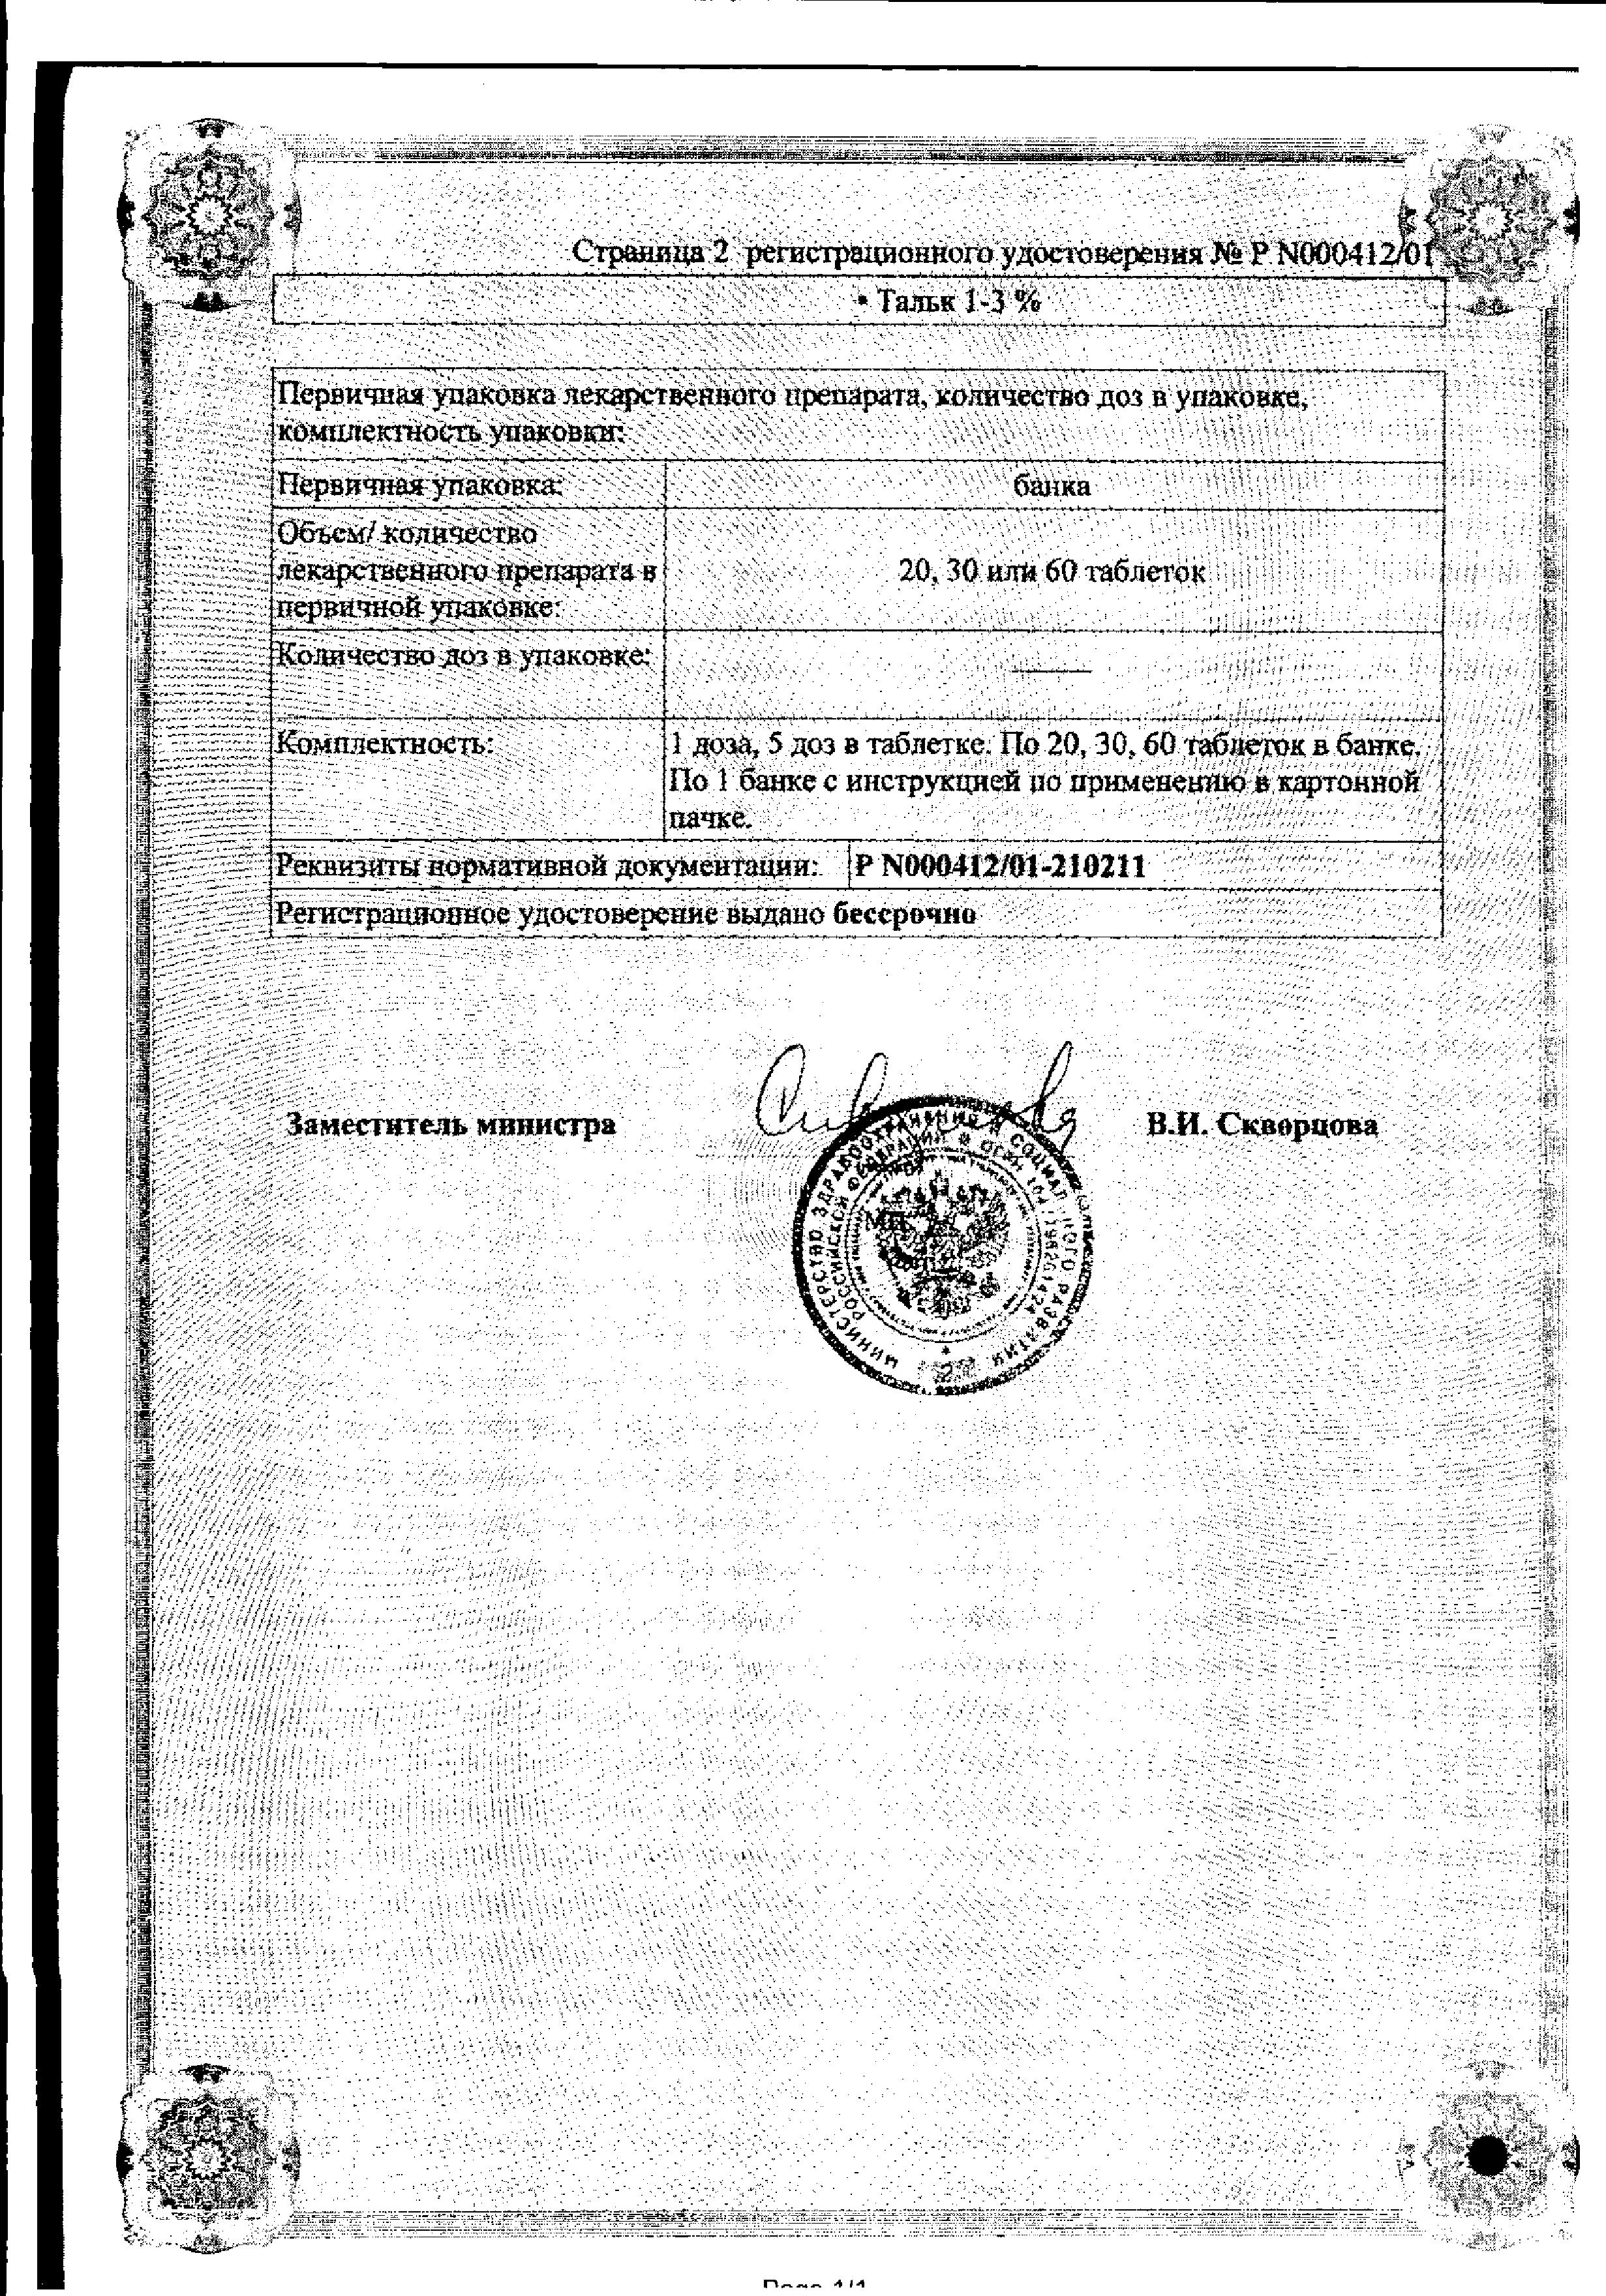 Бифидумбактерин таблетки сертификат